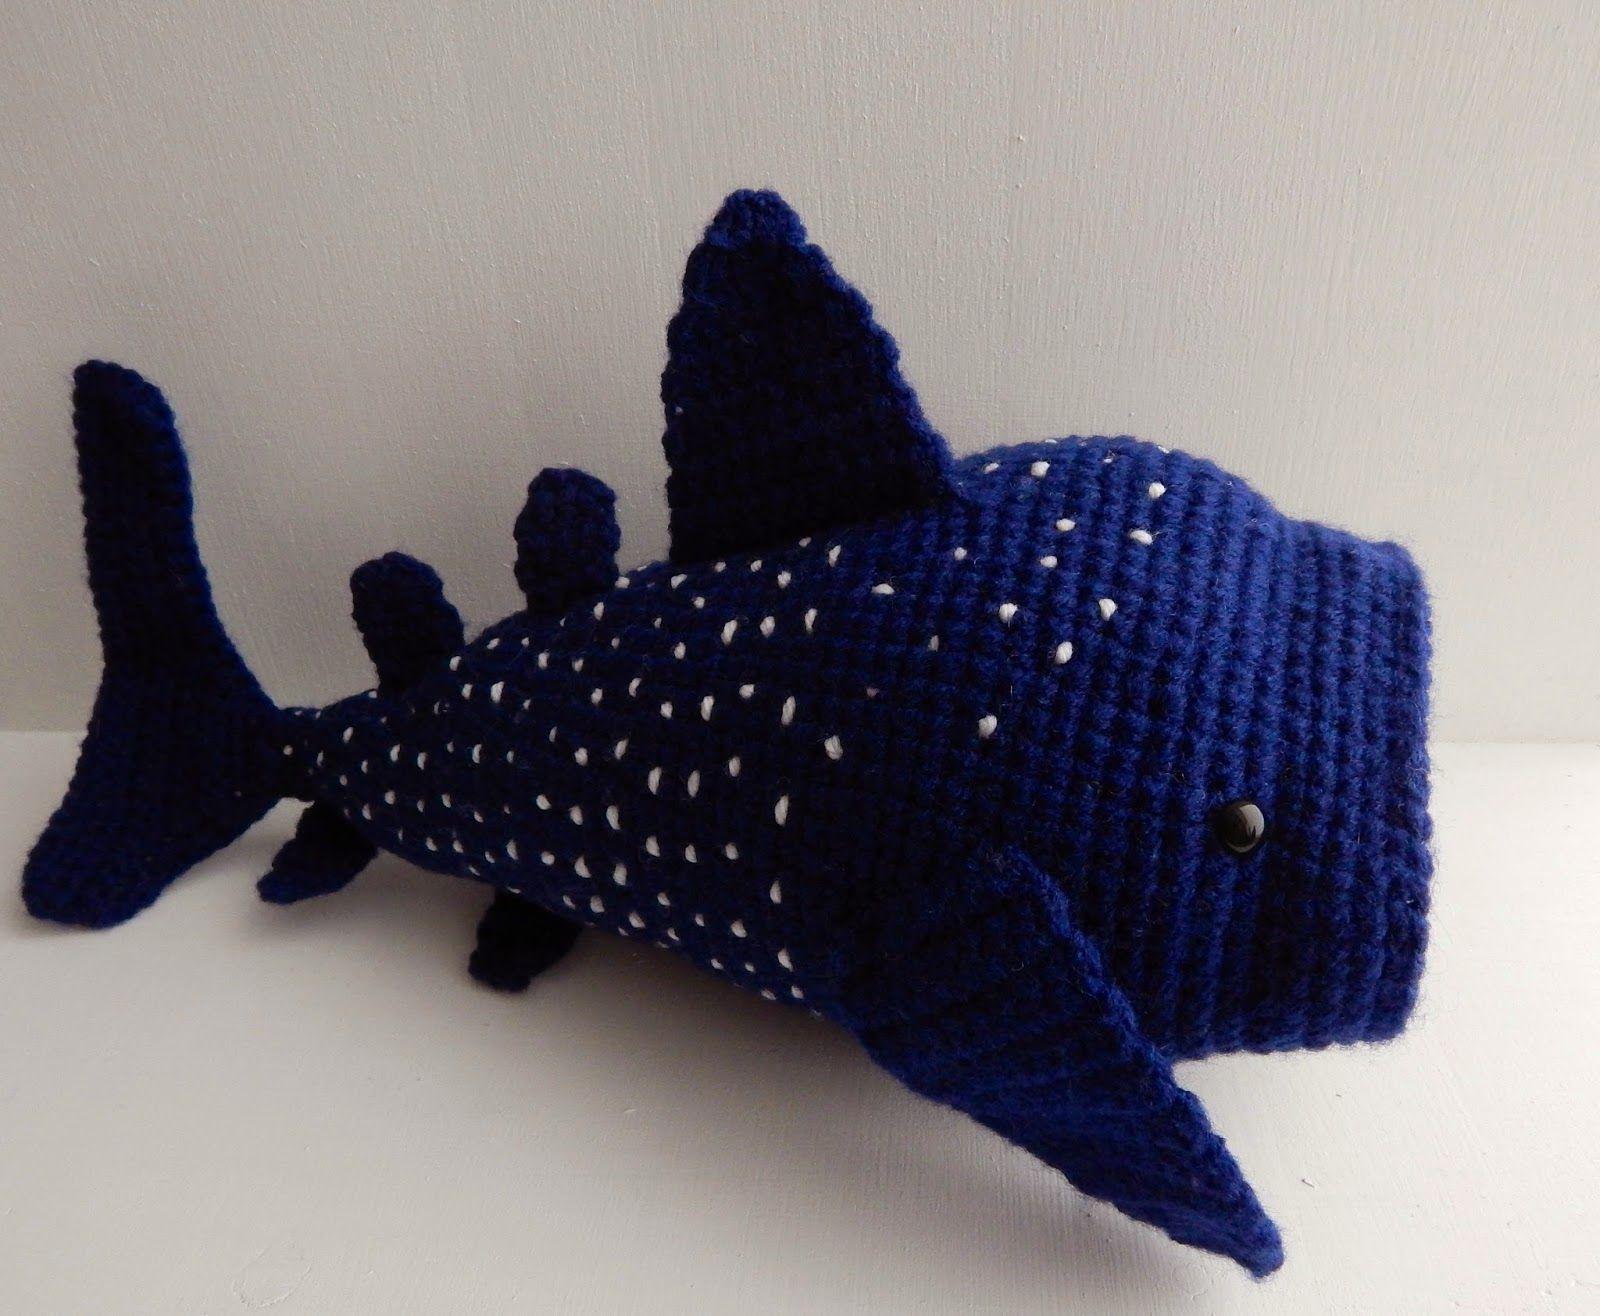 Free Amigurumi Patterns Uk : Whale shark free amigurumi pattern amidorablecrochet